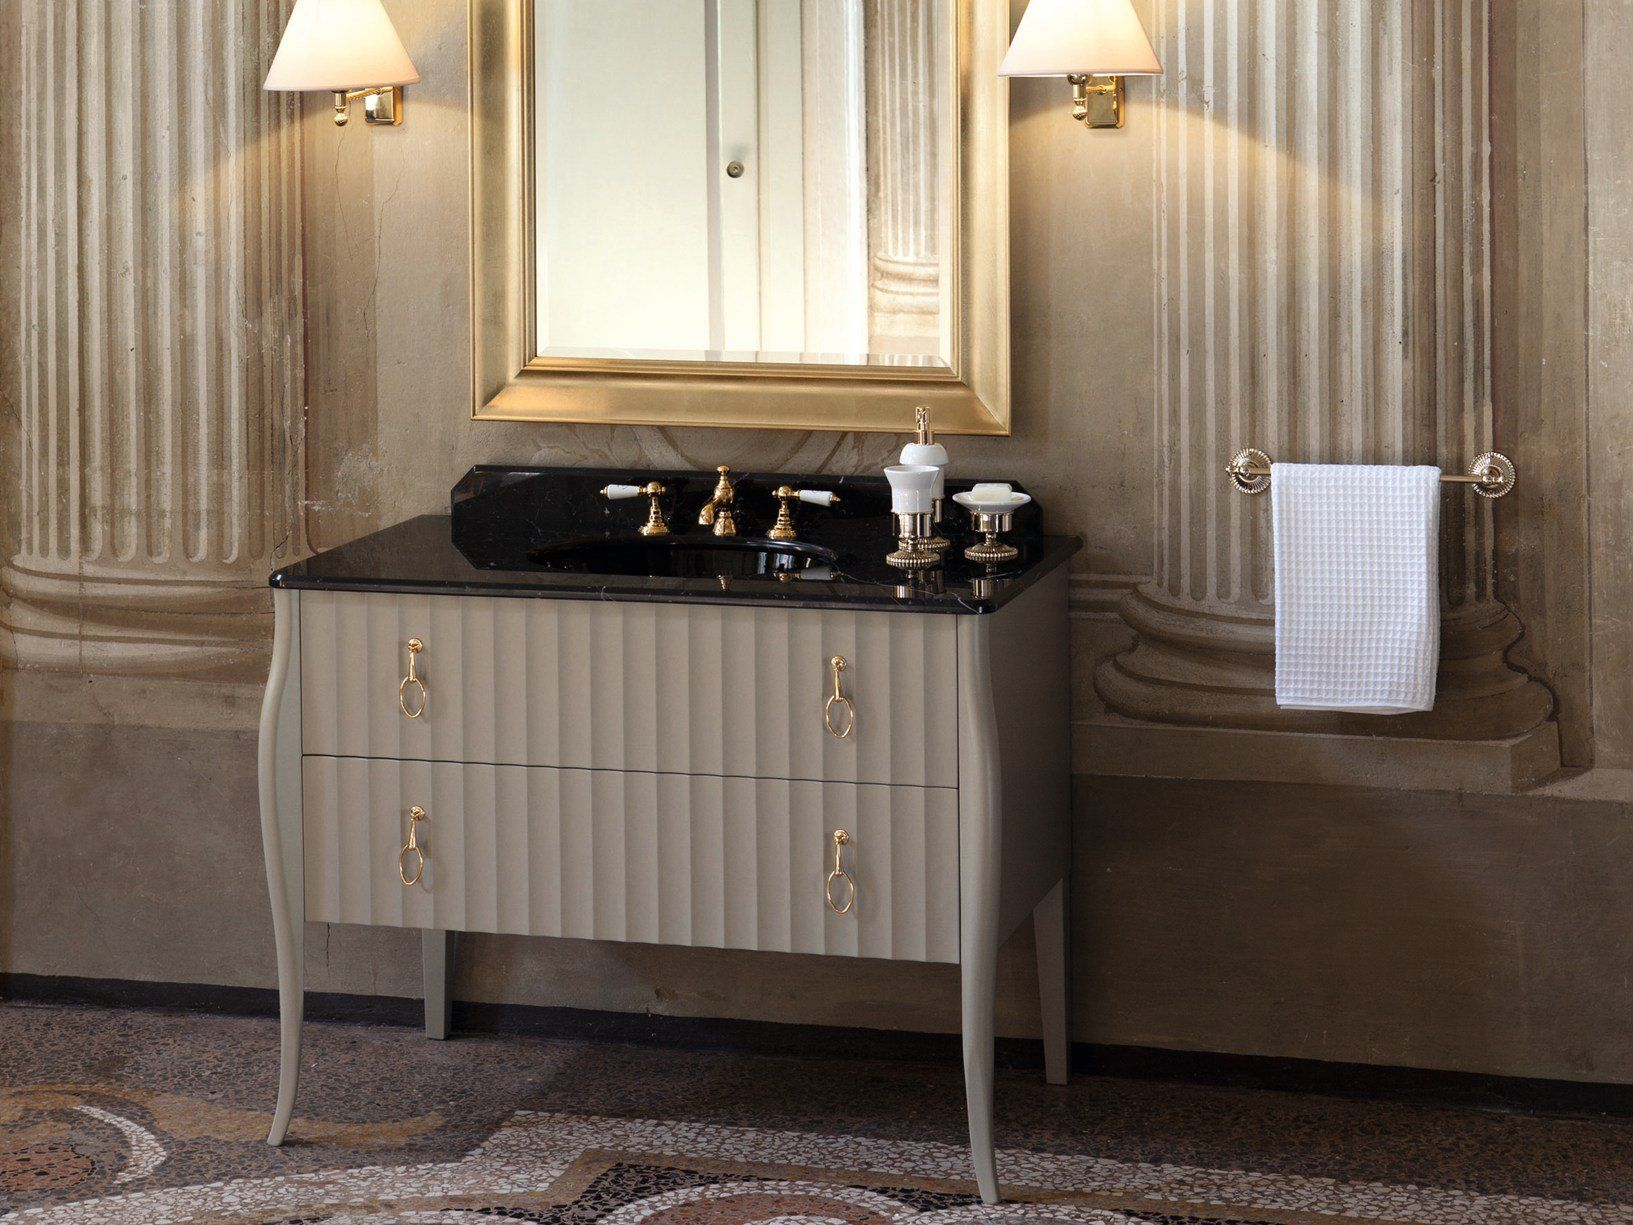 Gentry home presenta i mobili da bagno charlotte - Mobili da bagno eleganti ...